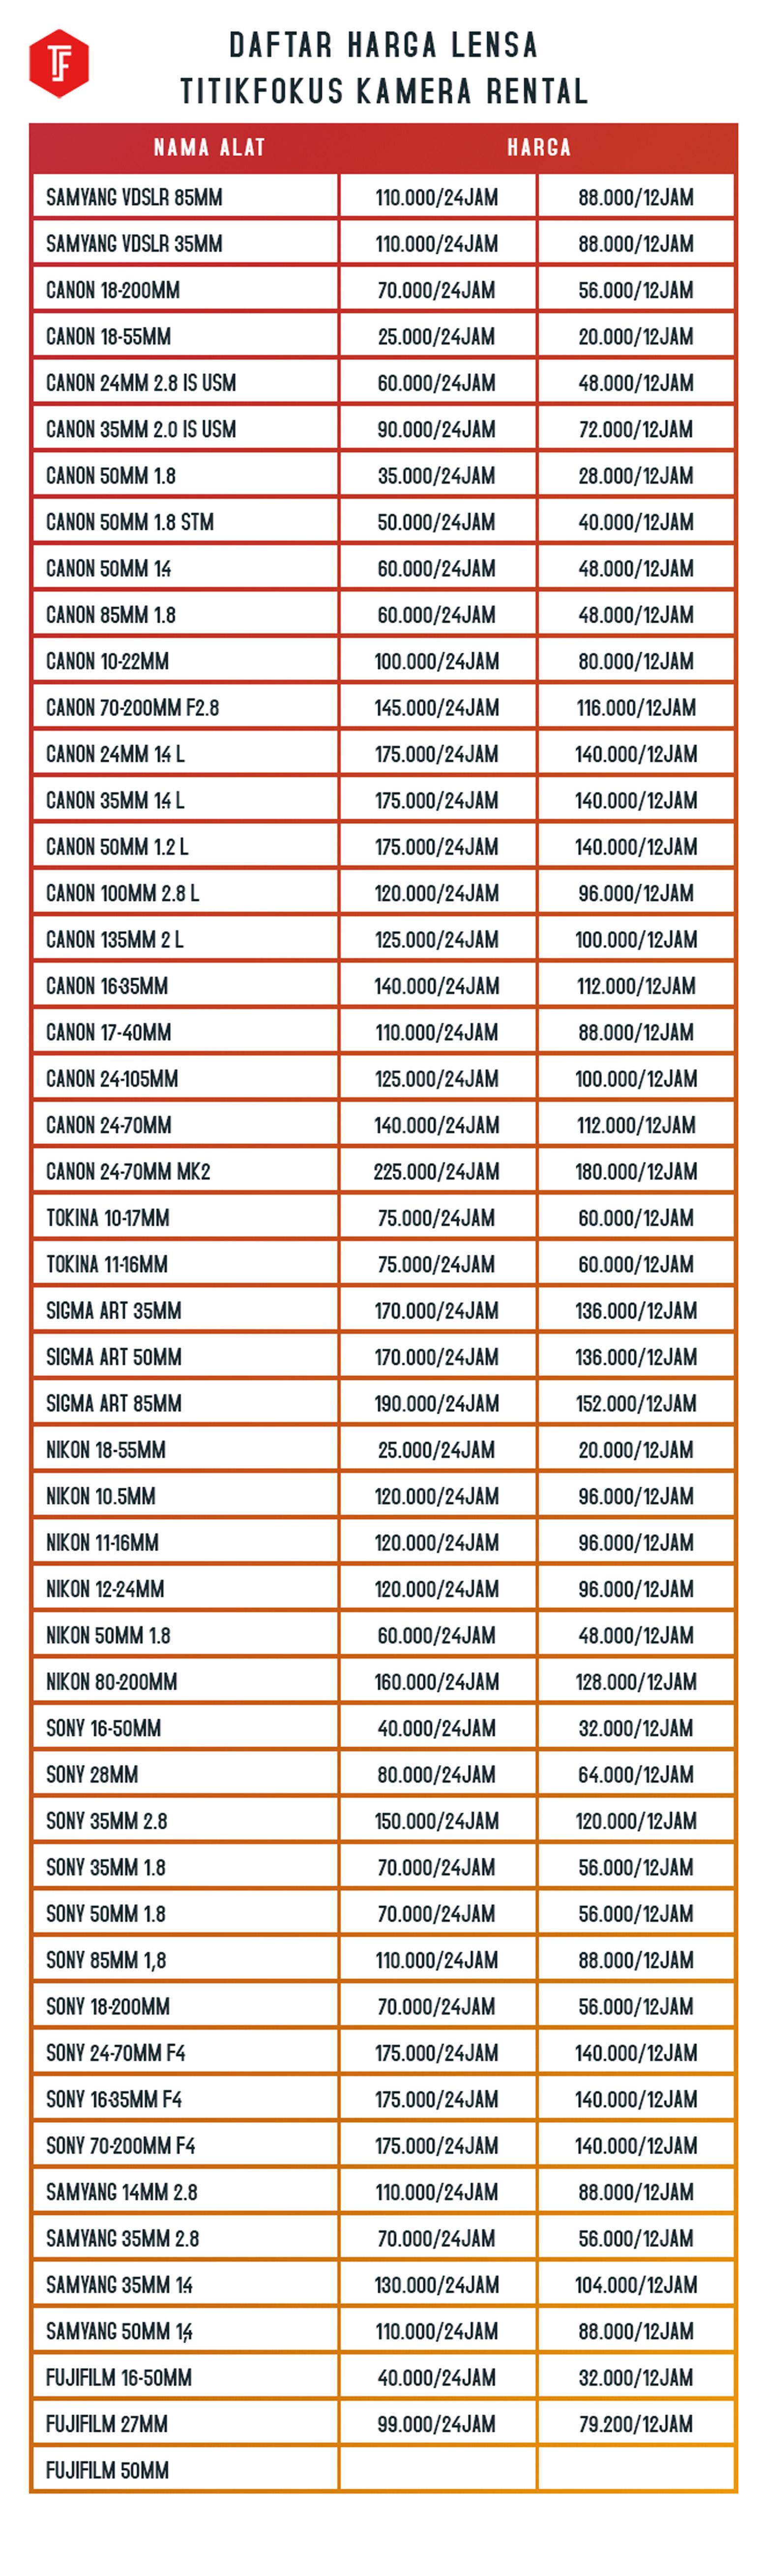 Daftar Harga TF Lensa Semarang